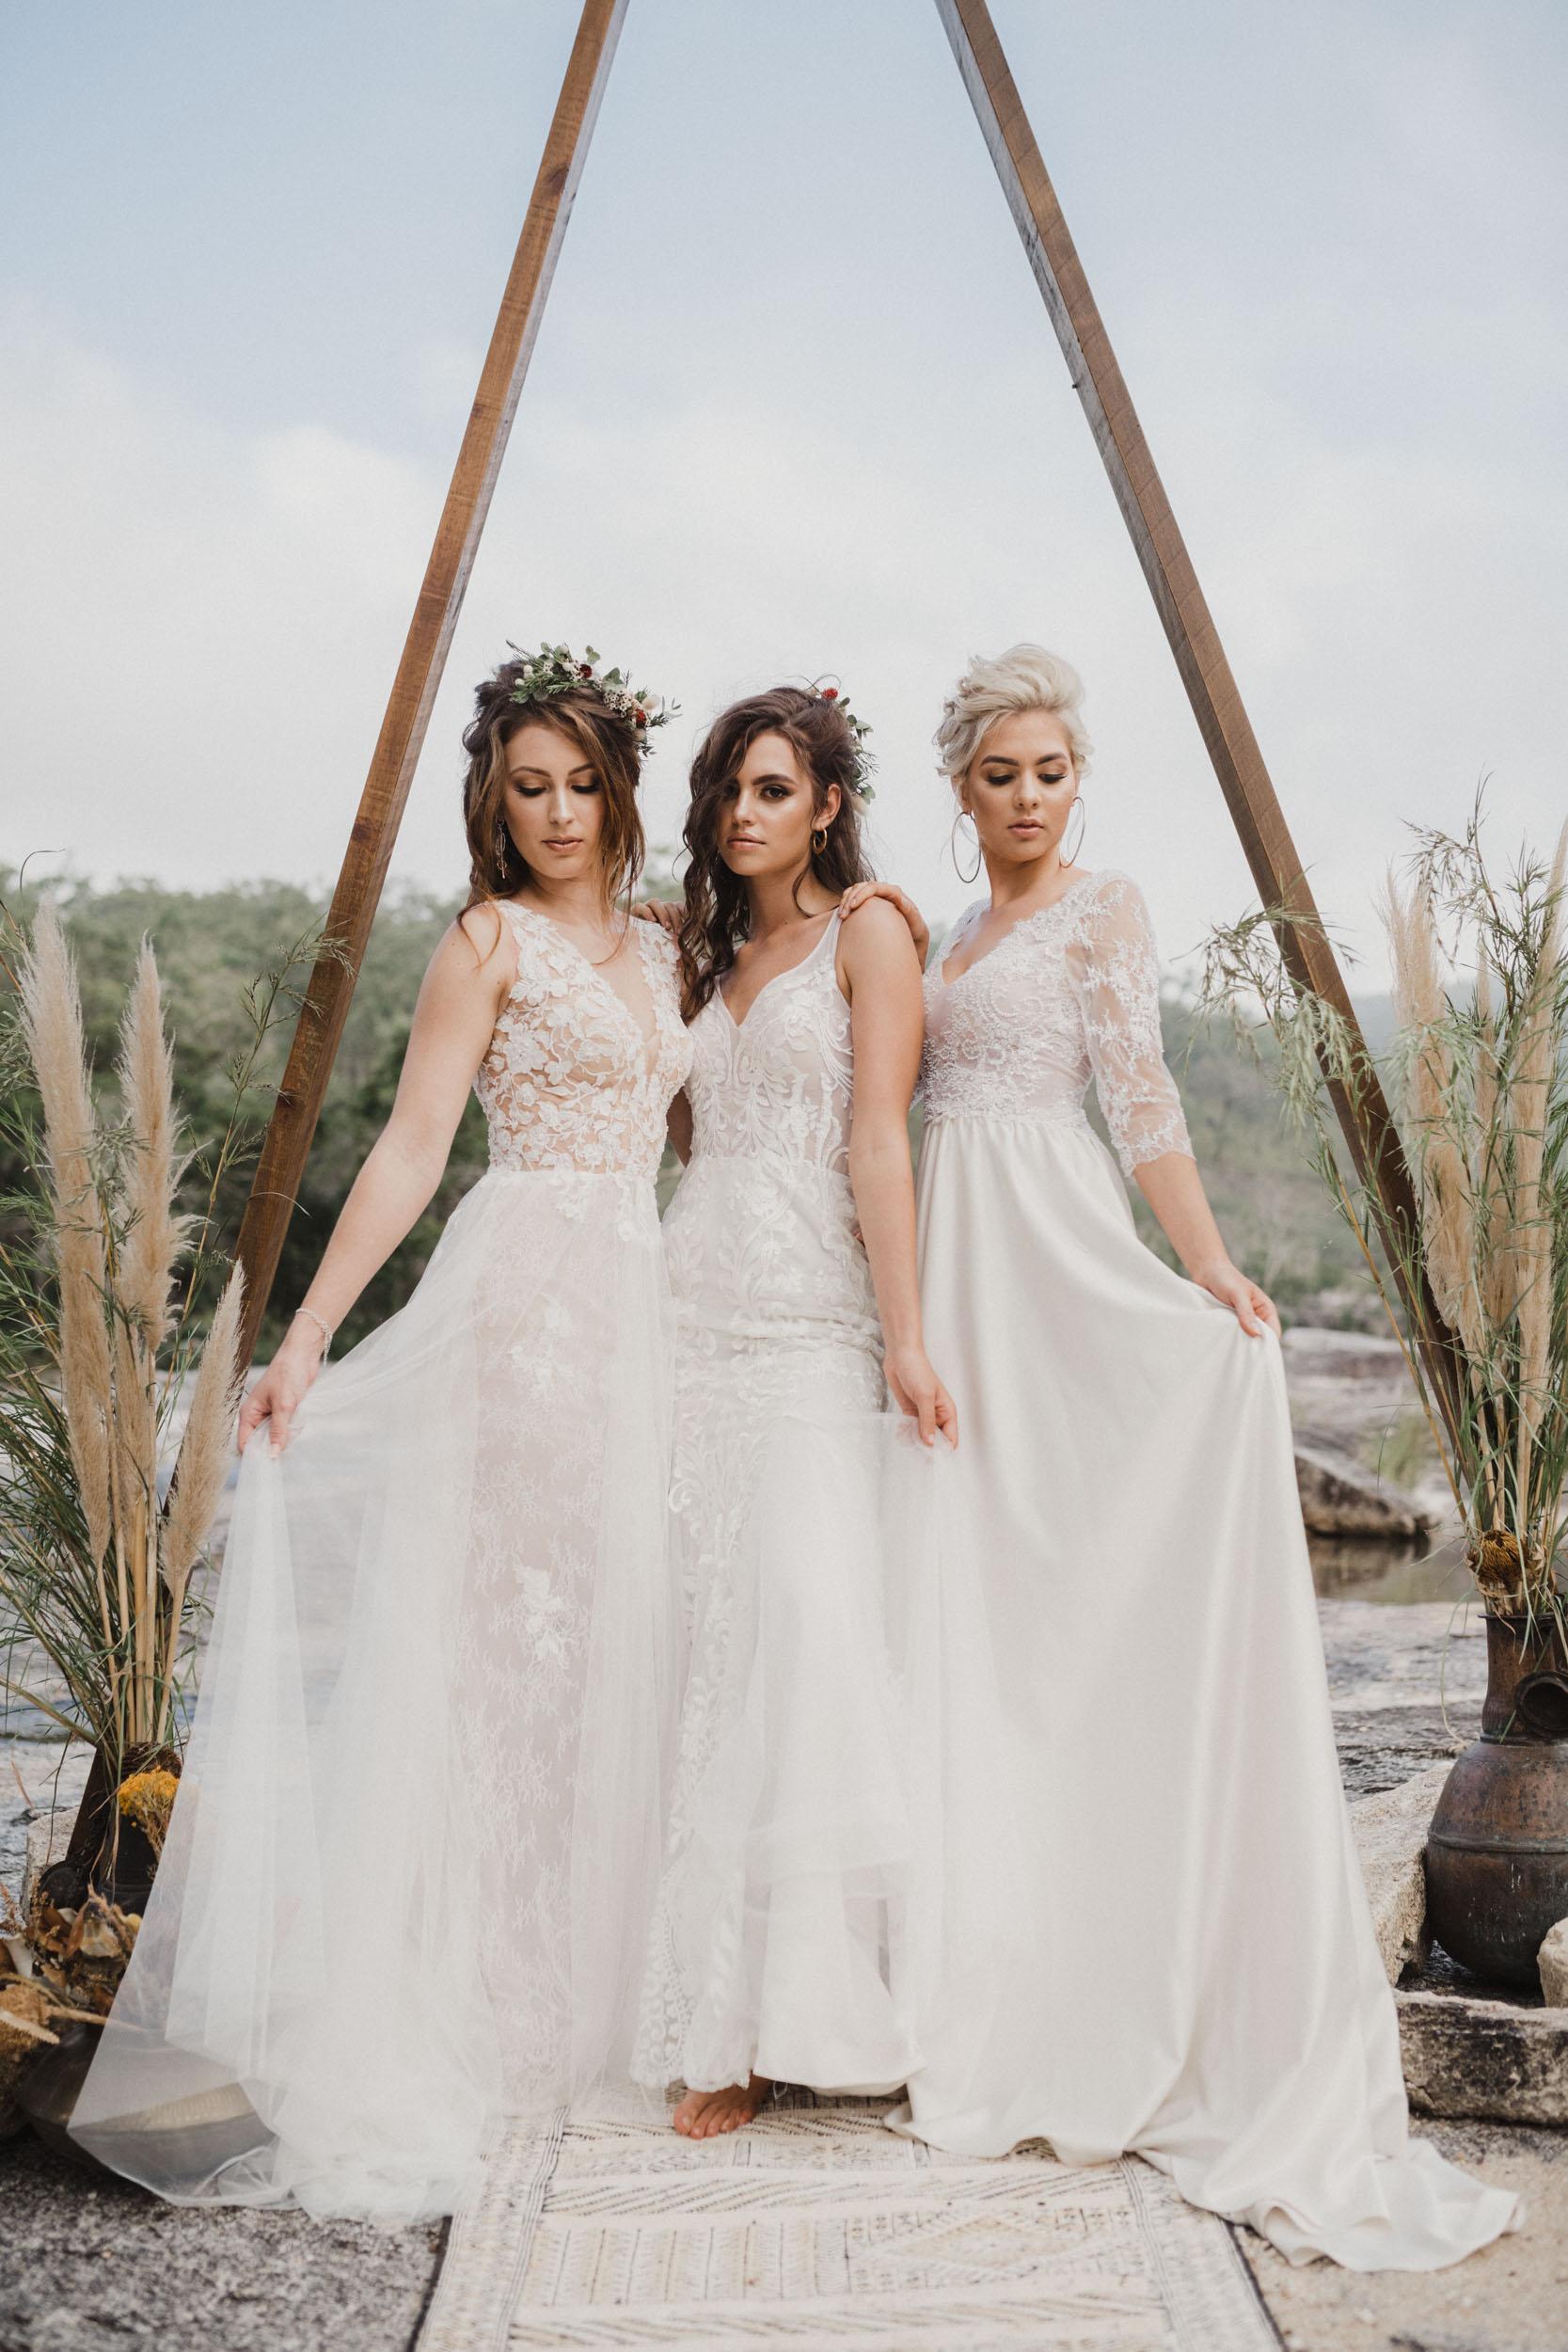 Yumna Zaidi is Looking Beautiful in her Latest Bridal Shoot ...   2500x1667